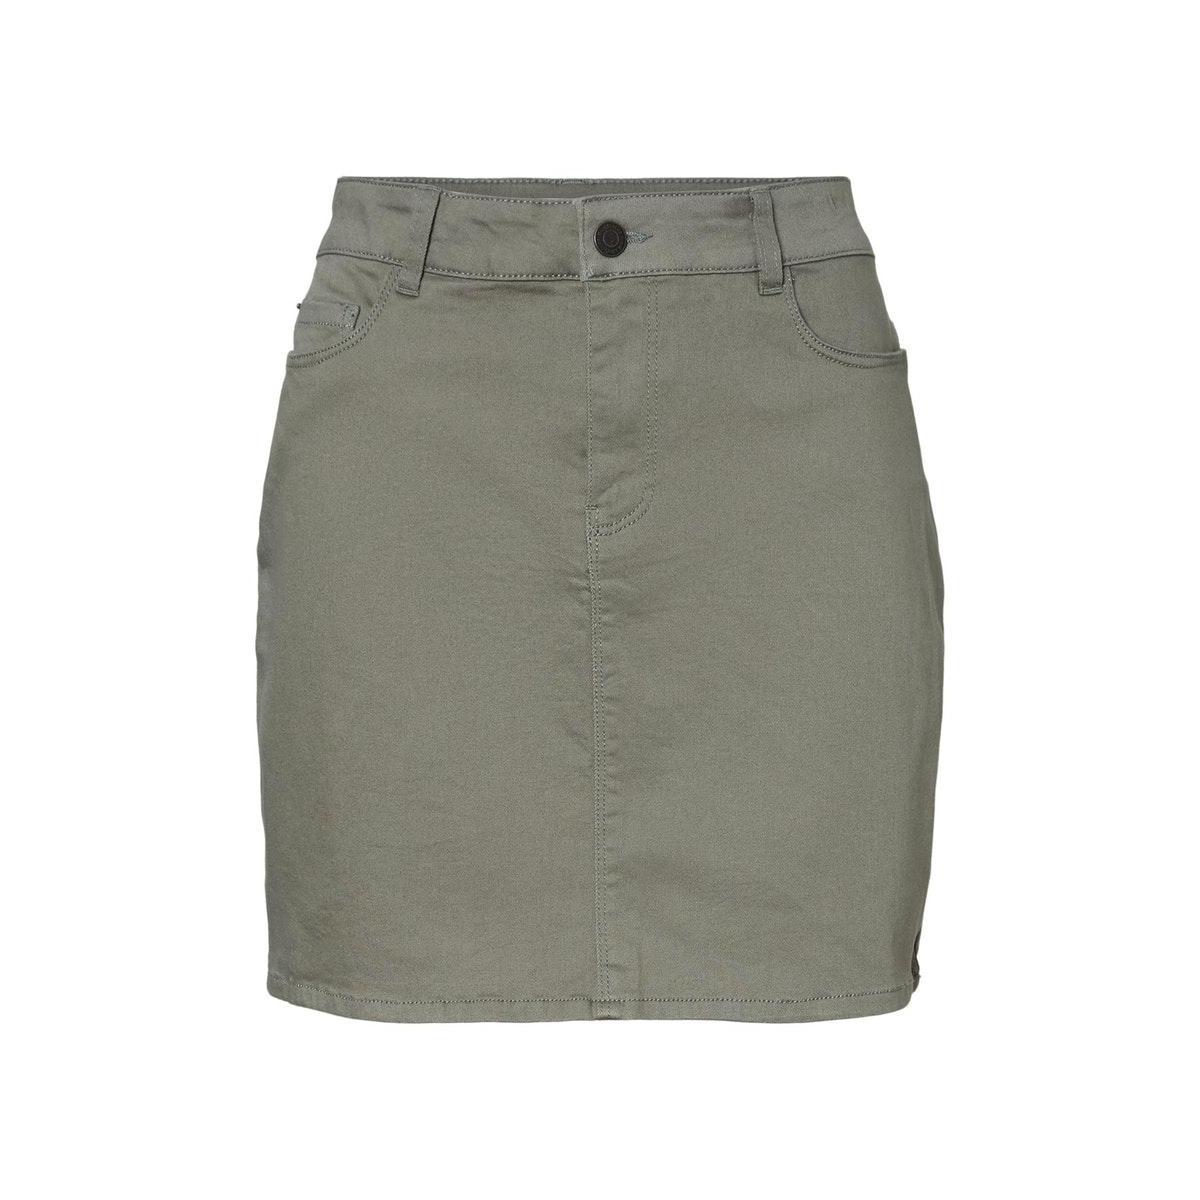 vmhot seven mr short skirt color 10209896 vero moda rok laurel wreath